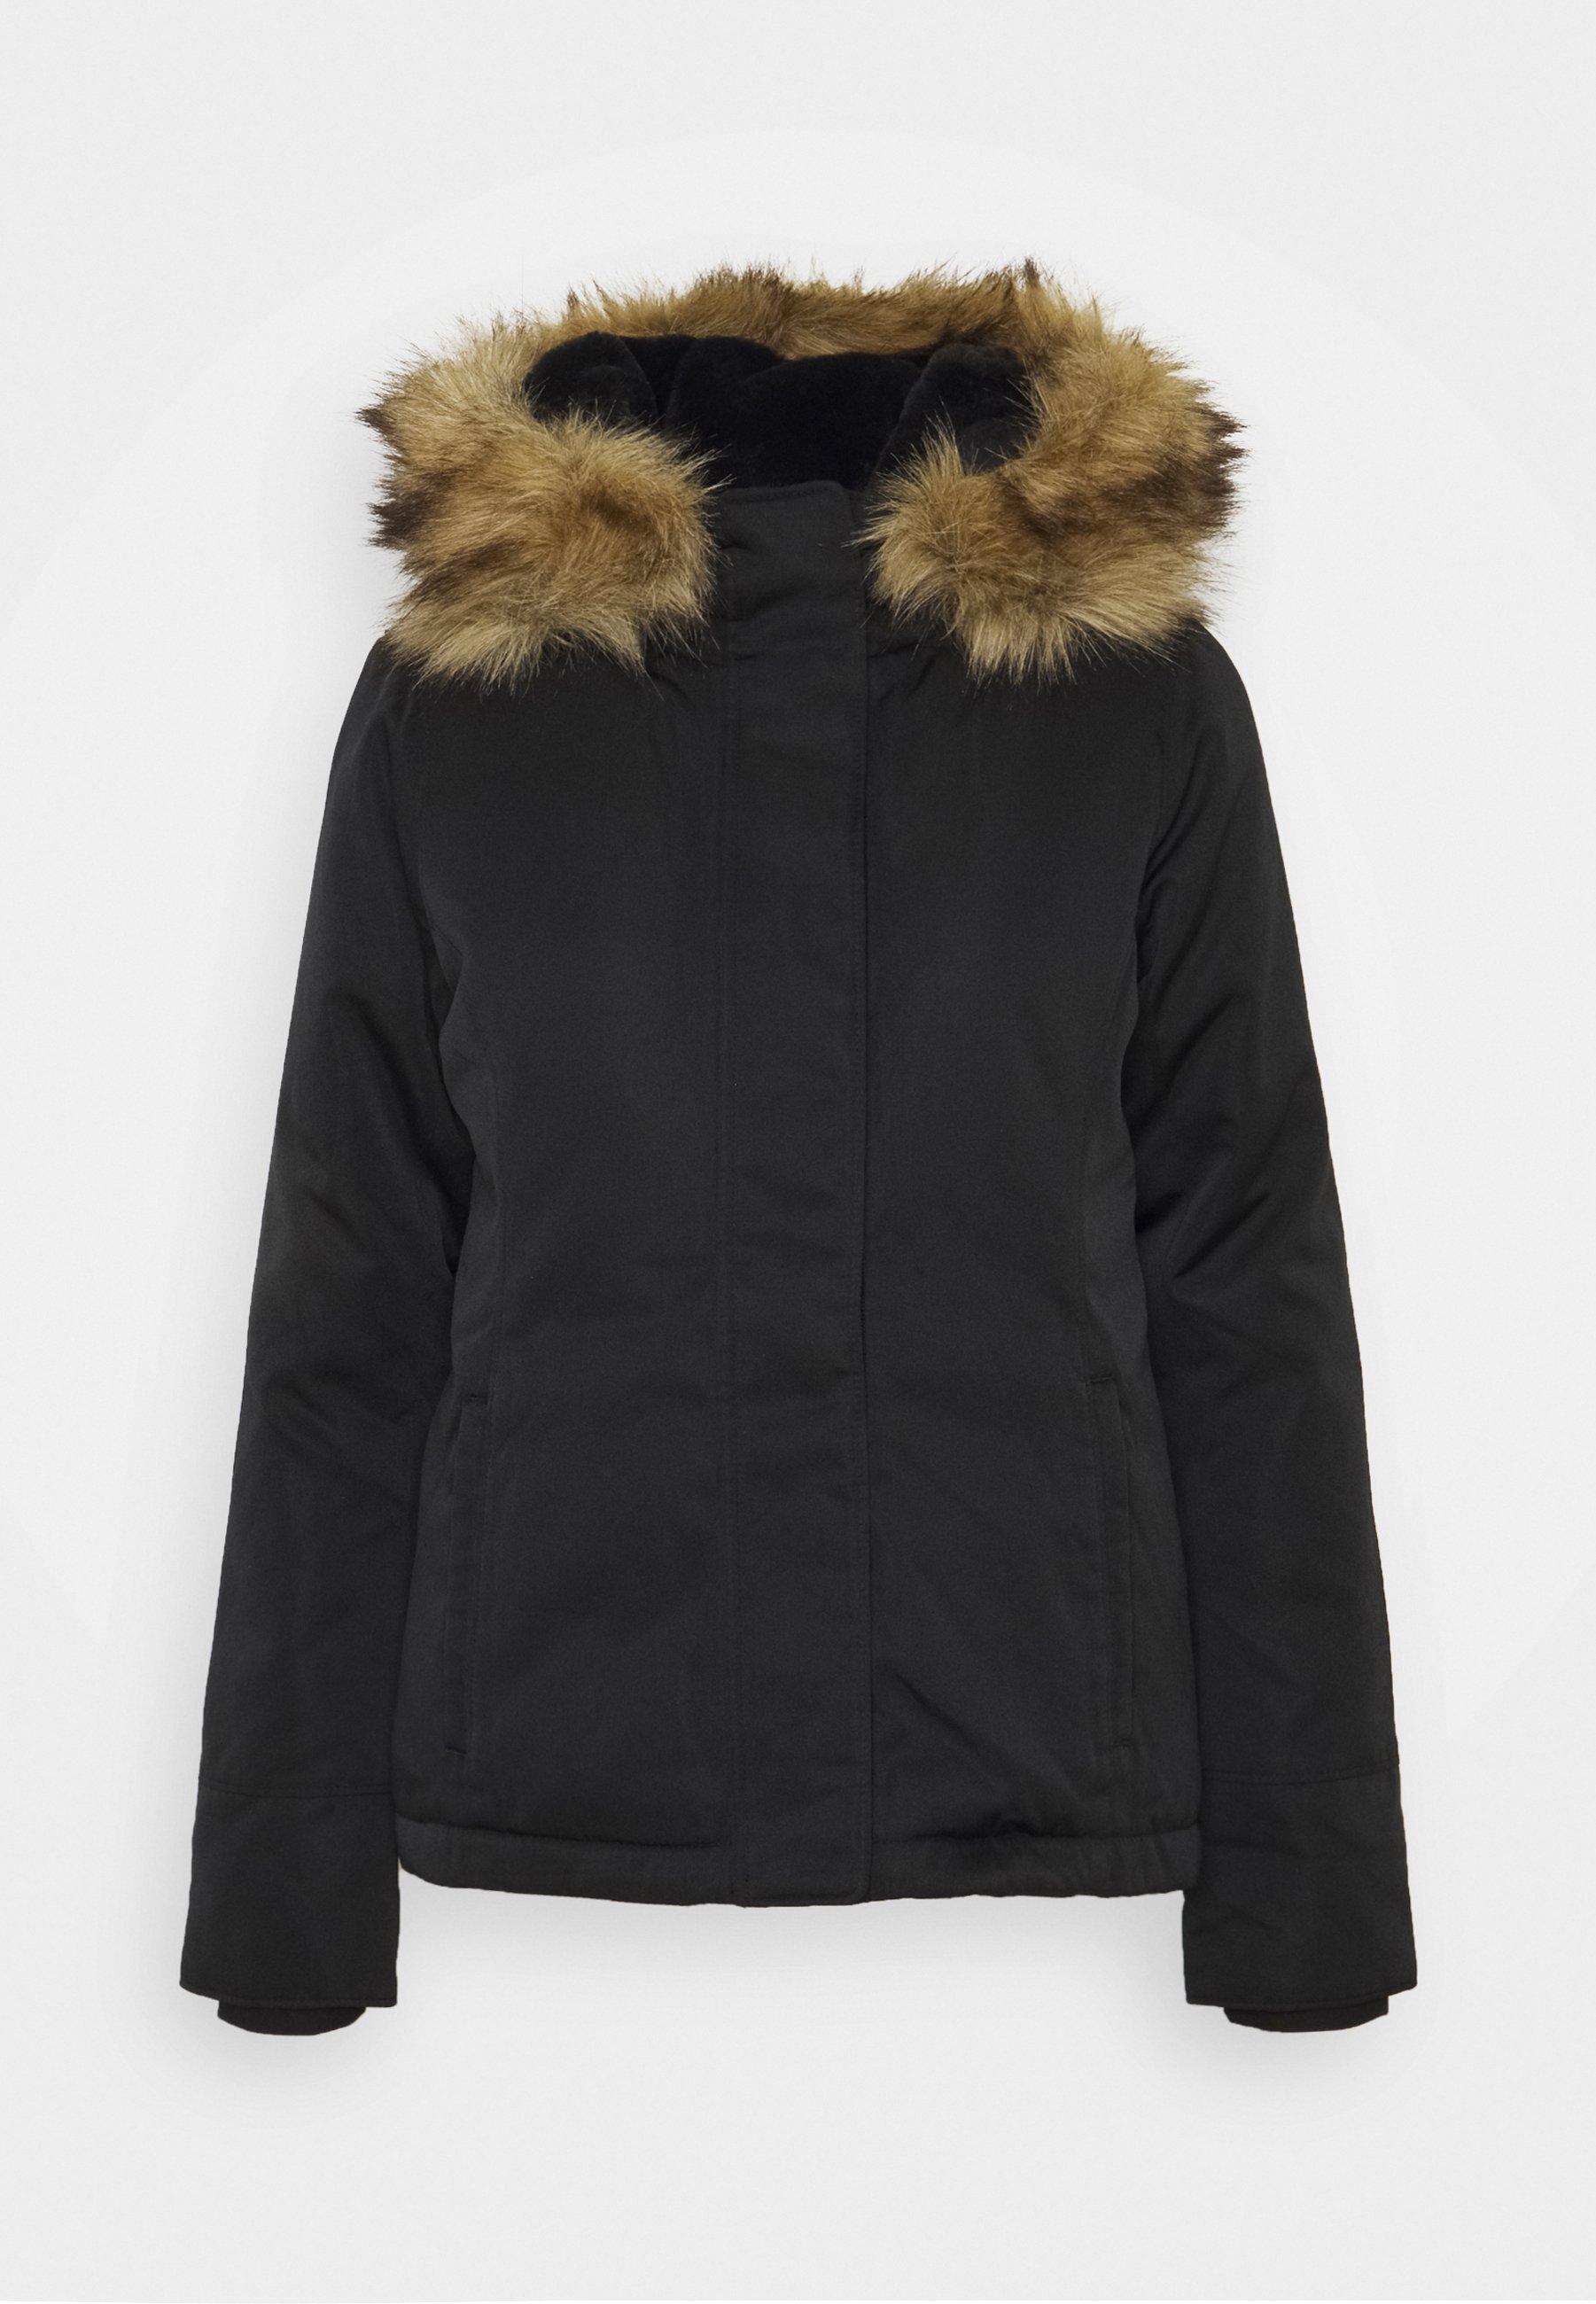 Abercrombie & Fitch Dames jassen online kopen | Gratis